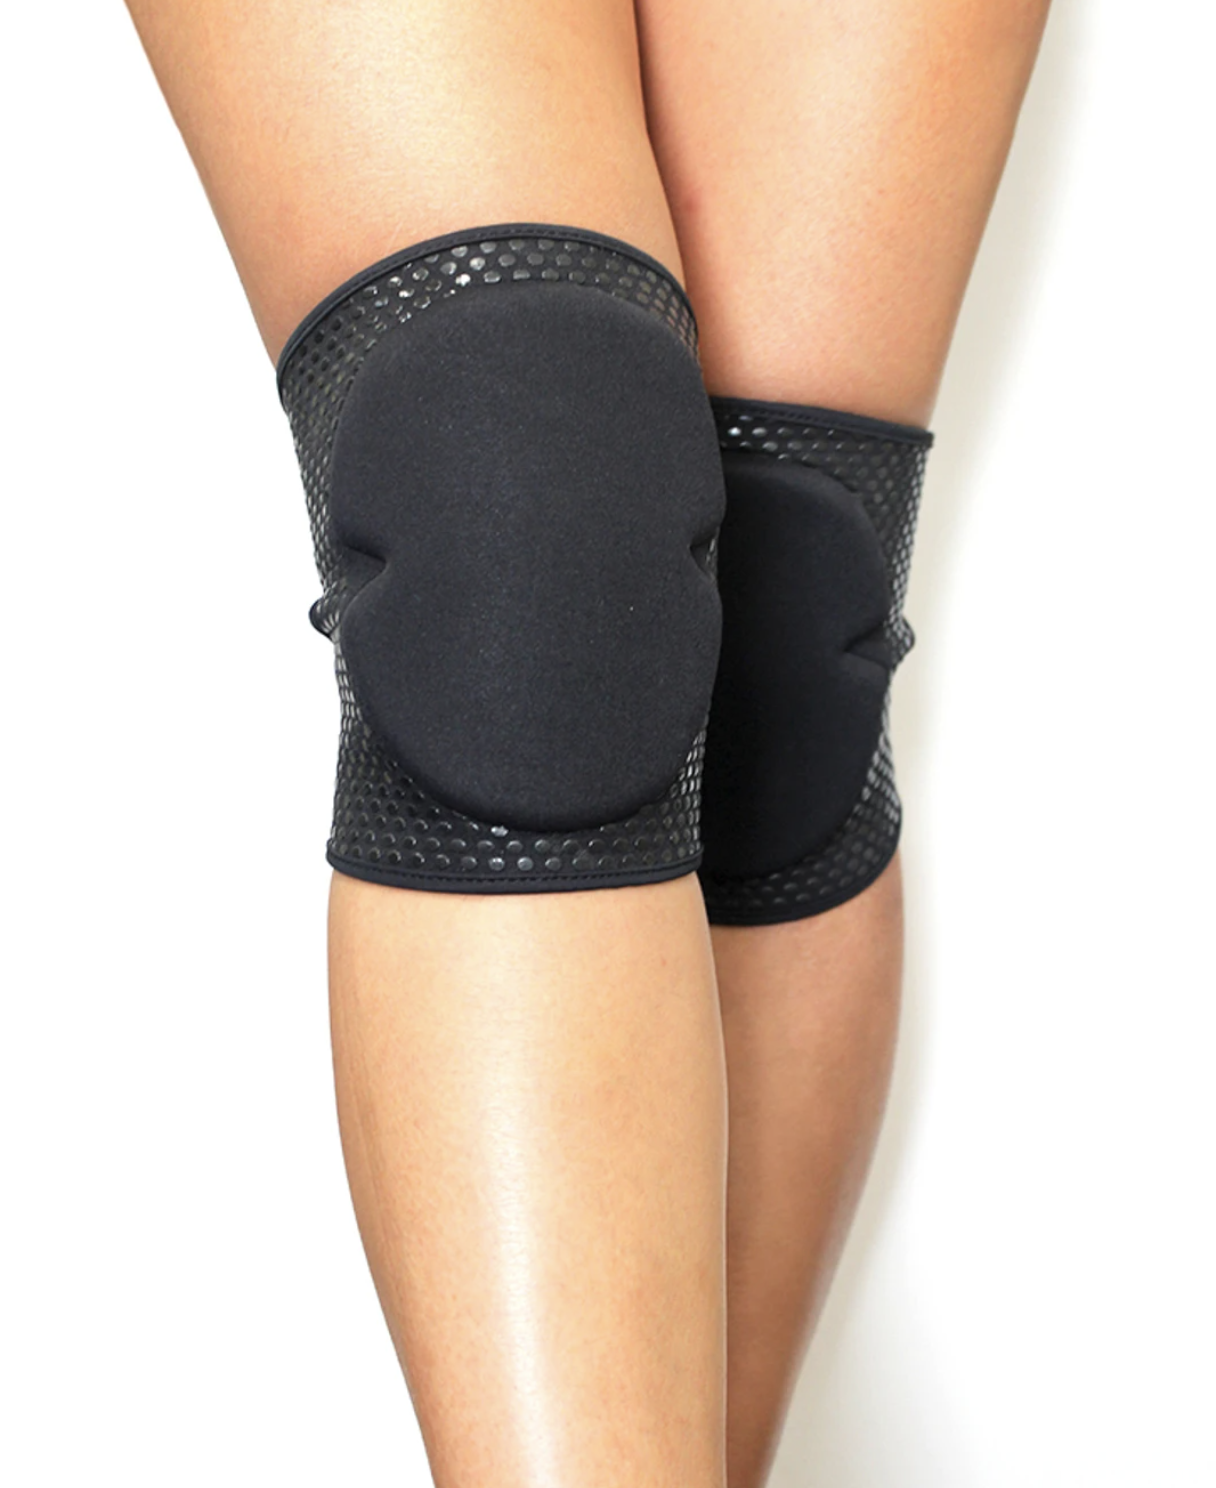 Sticky Knee Pads